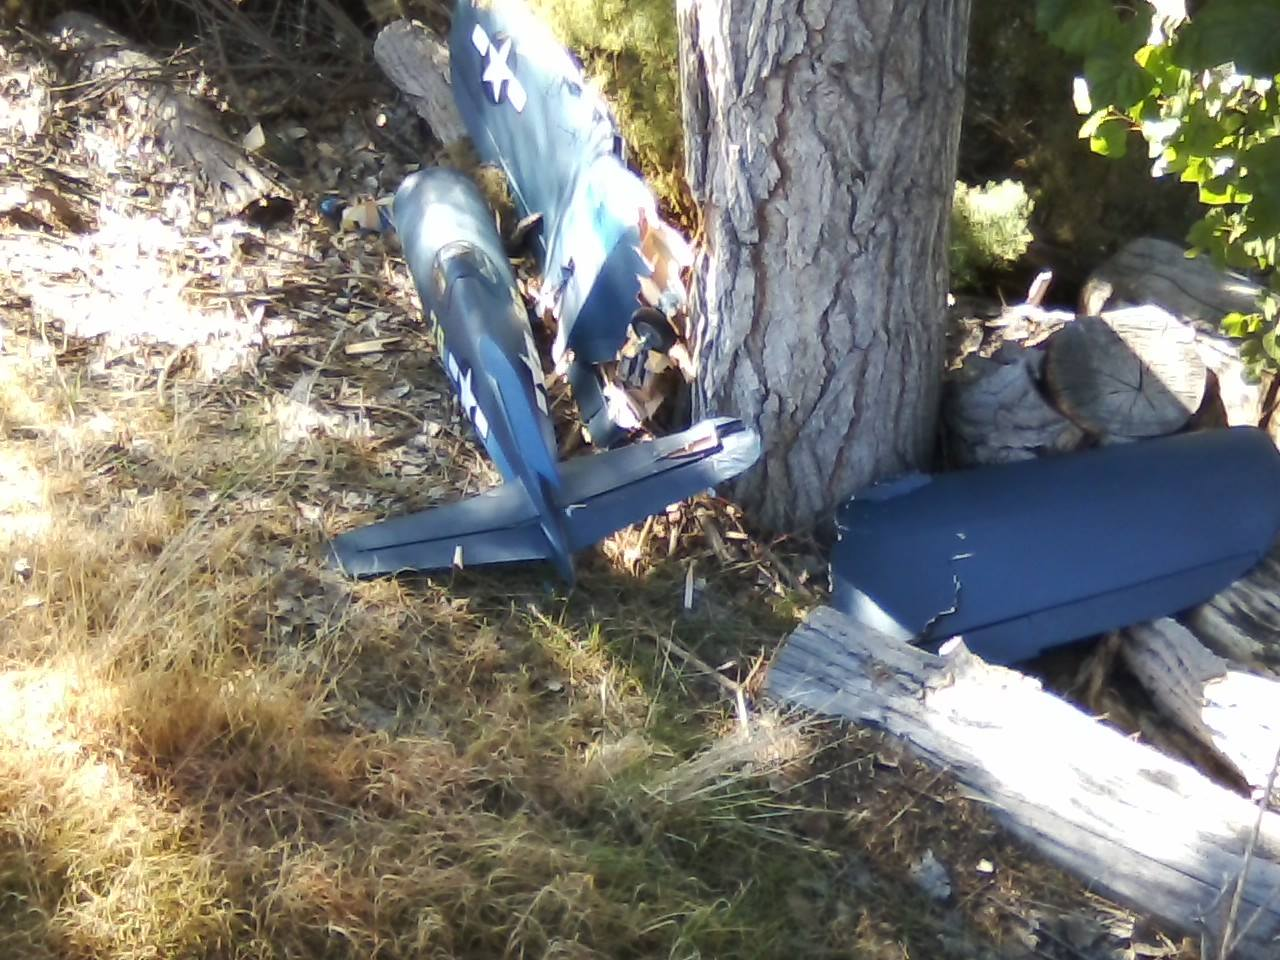 Click image for larger version  Name:corsair crash b.jpg Views:108 Size:188.4 KB ID:2210175